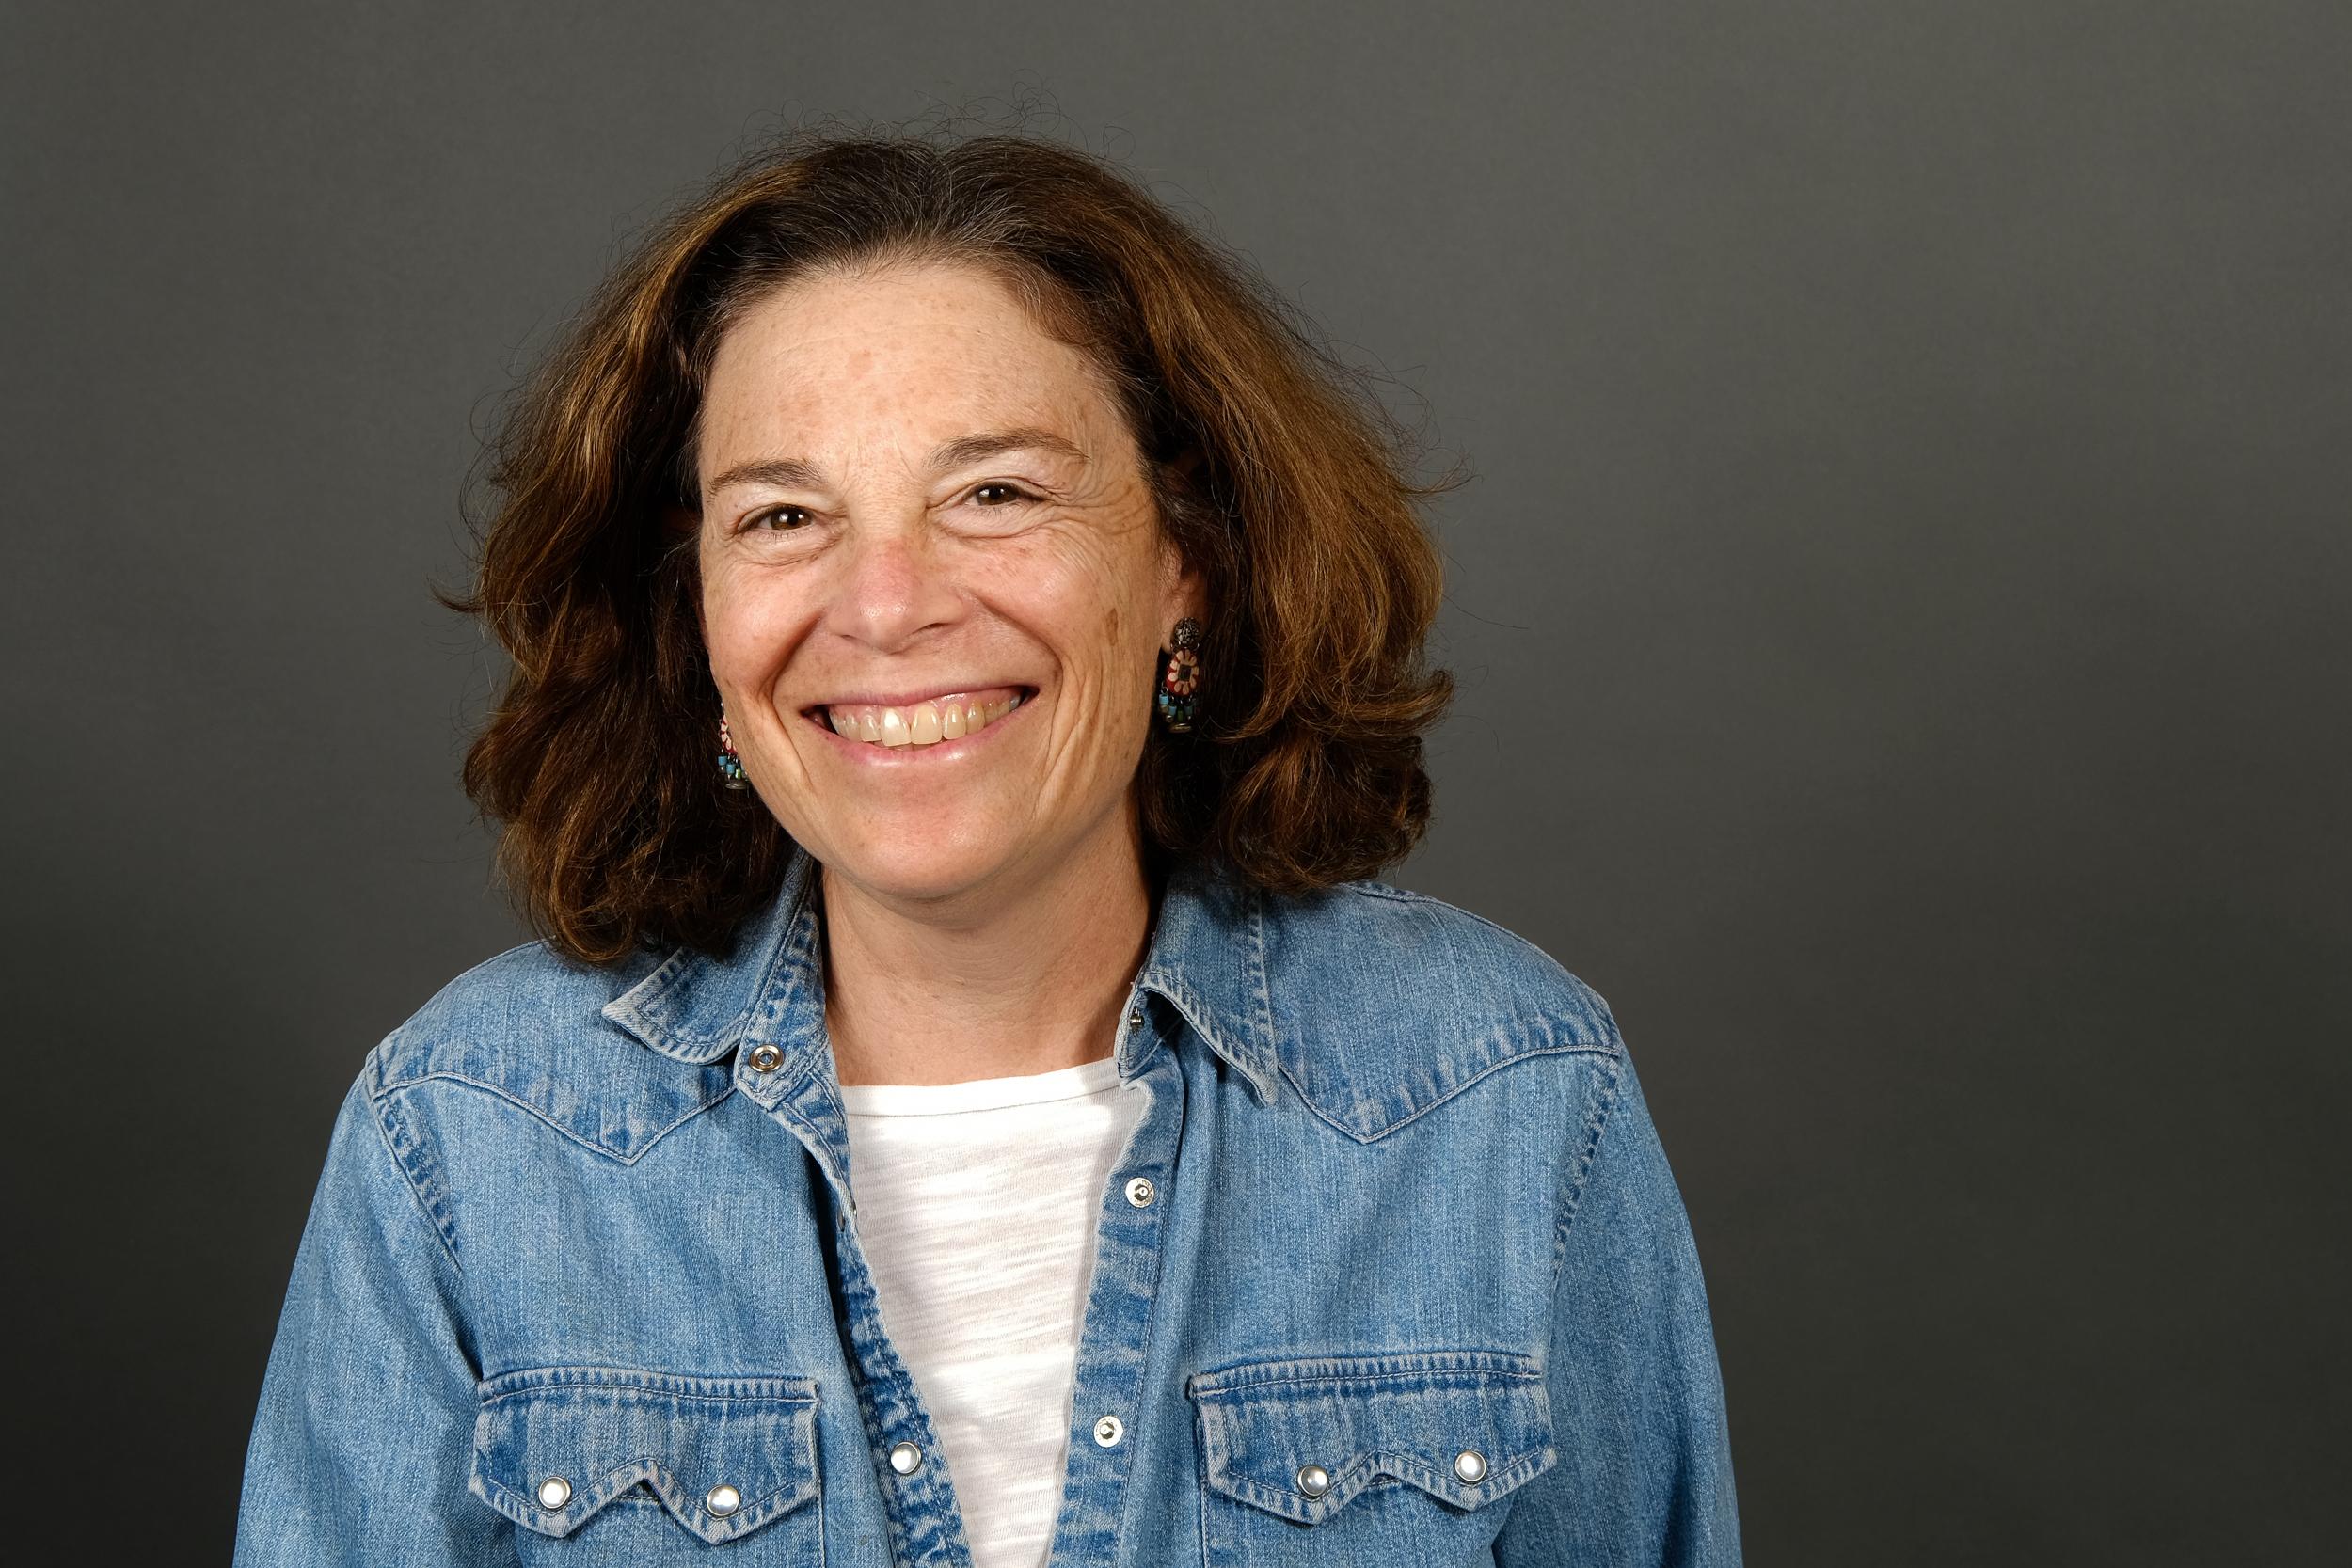 Bonnie Katz